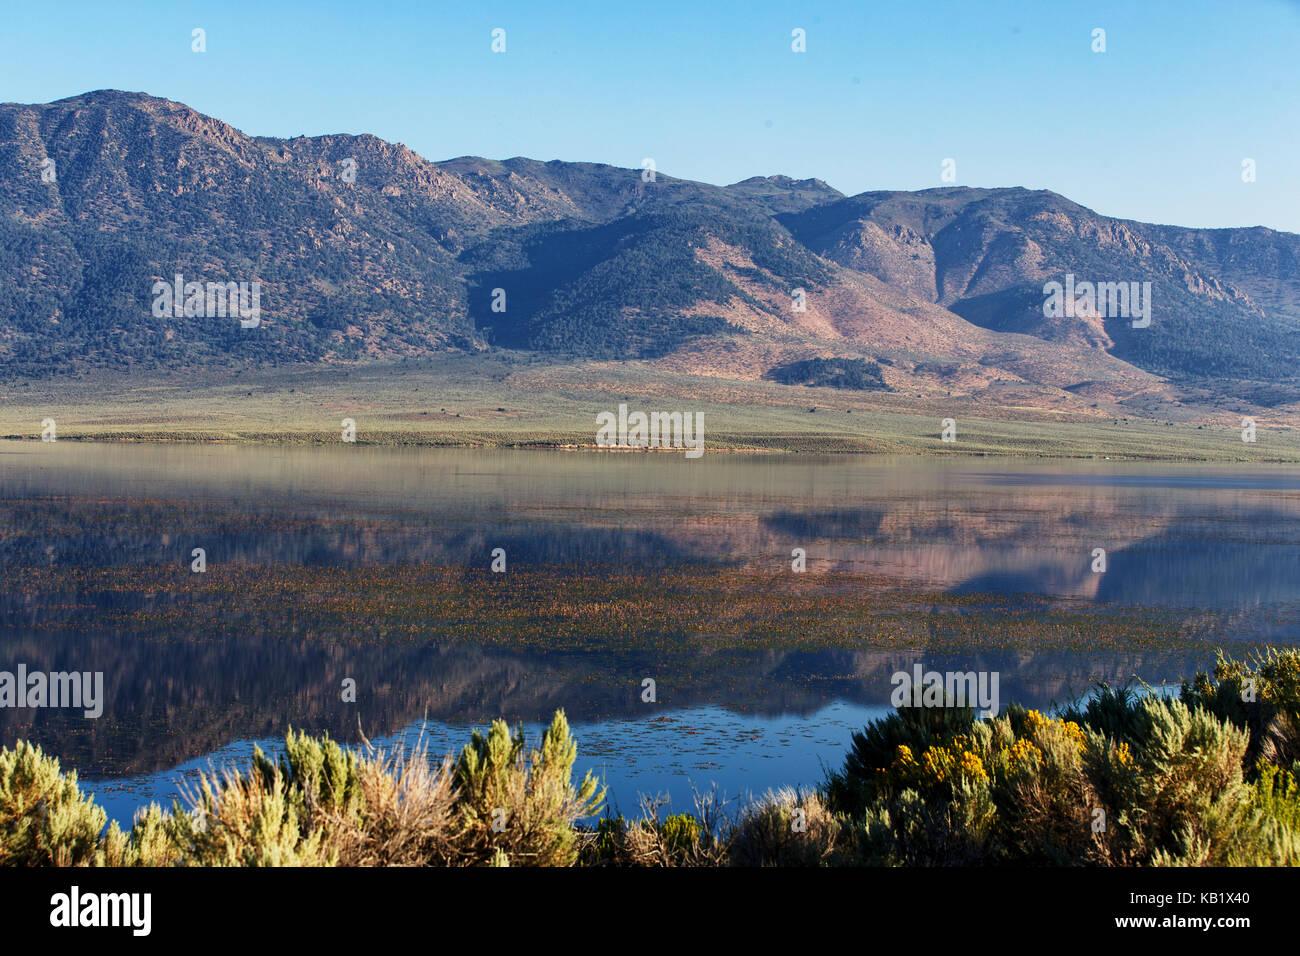 Bridgeport Reservoir near the high sierra town of Bridgeport in Mono County, California. August 7, 2017. Stock Photo